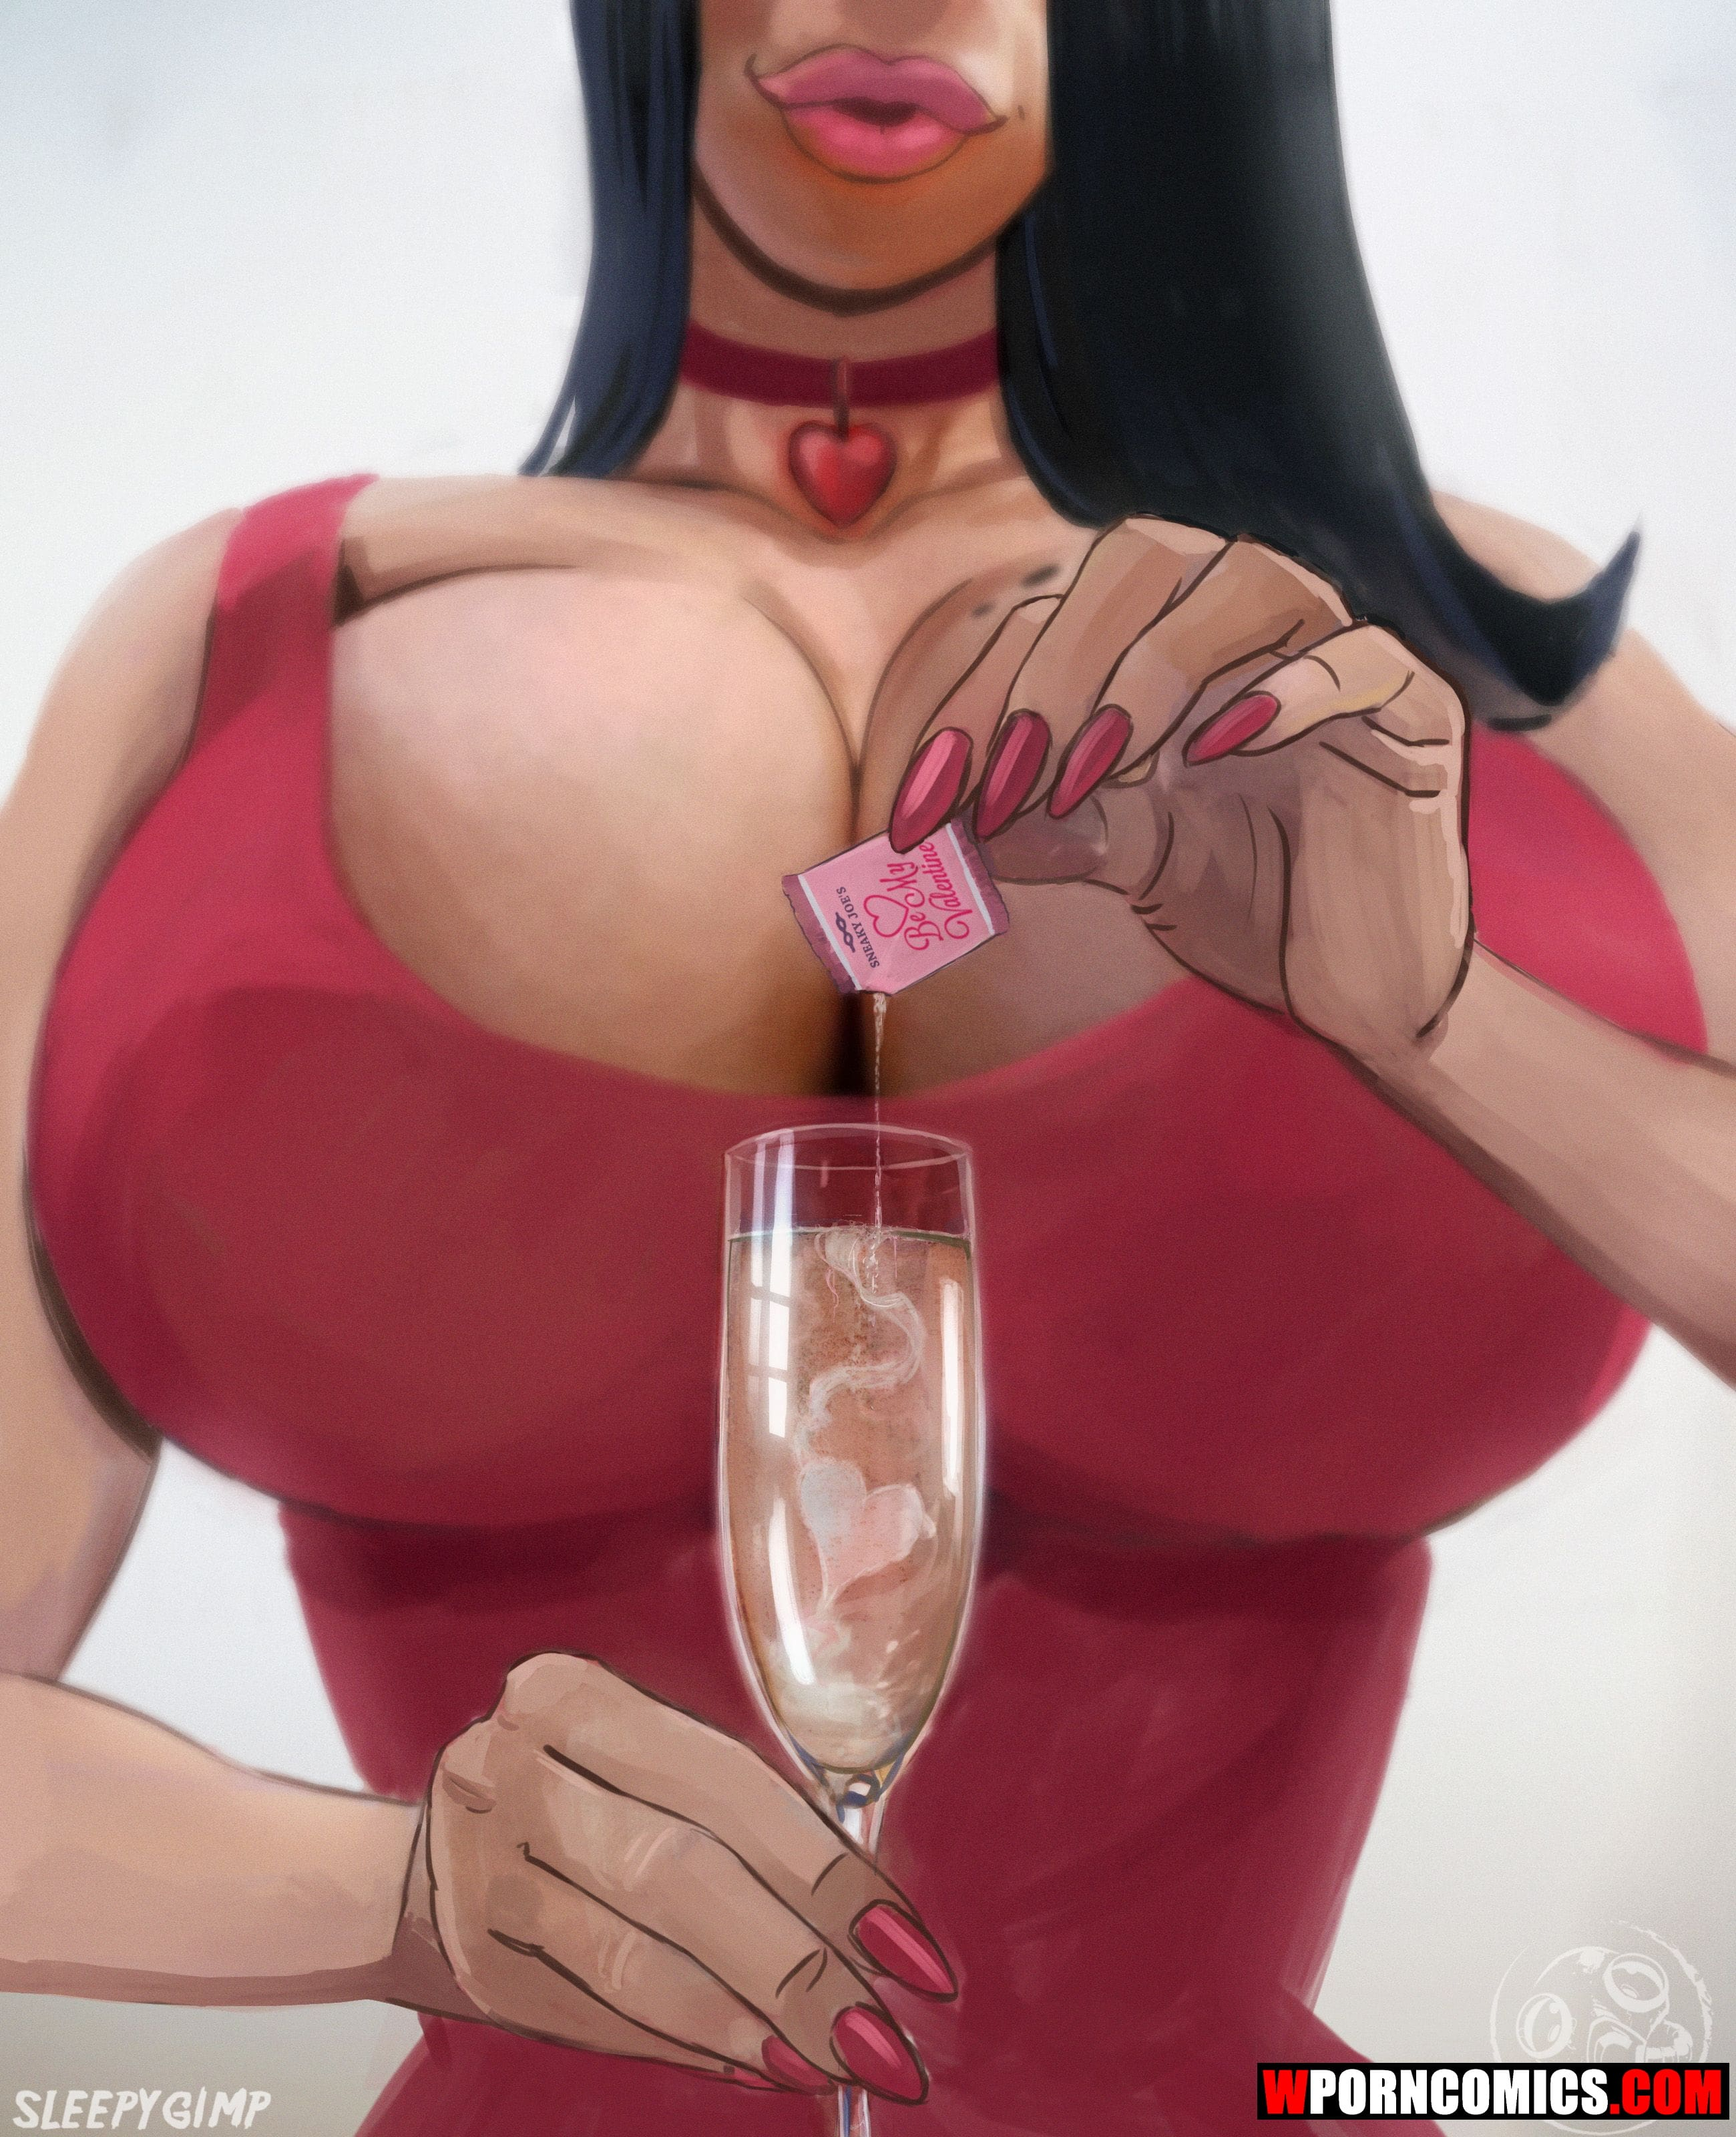 porn-comic-hypnotic-2020-03-10/porn-comic-hypnotic-2020-03-10-24846.jpeg